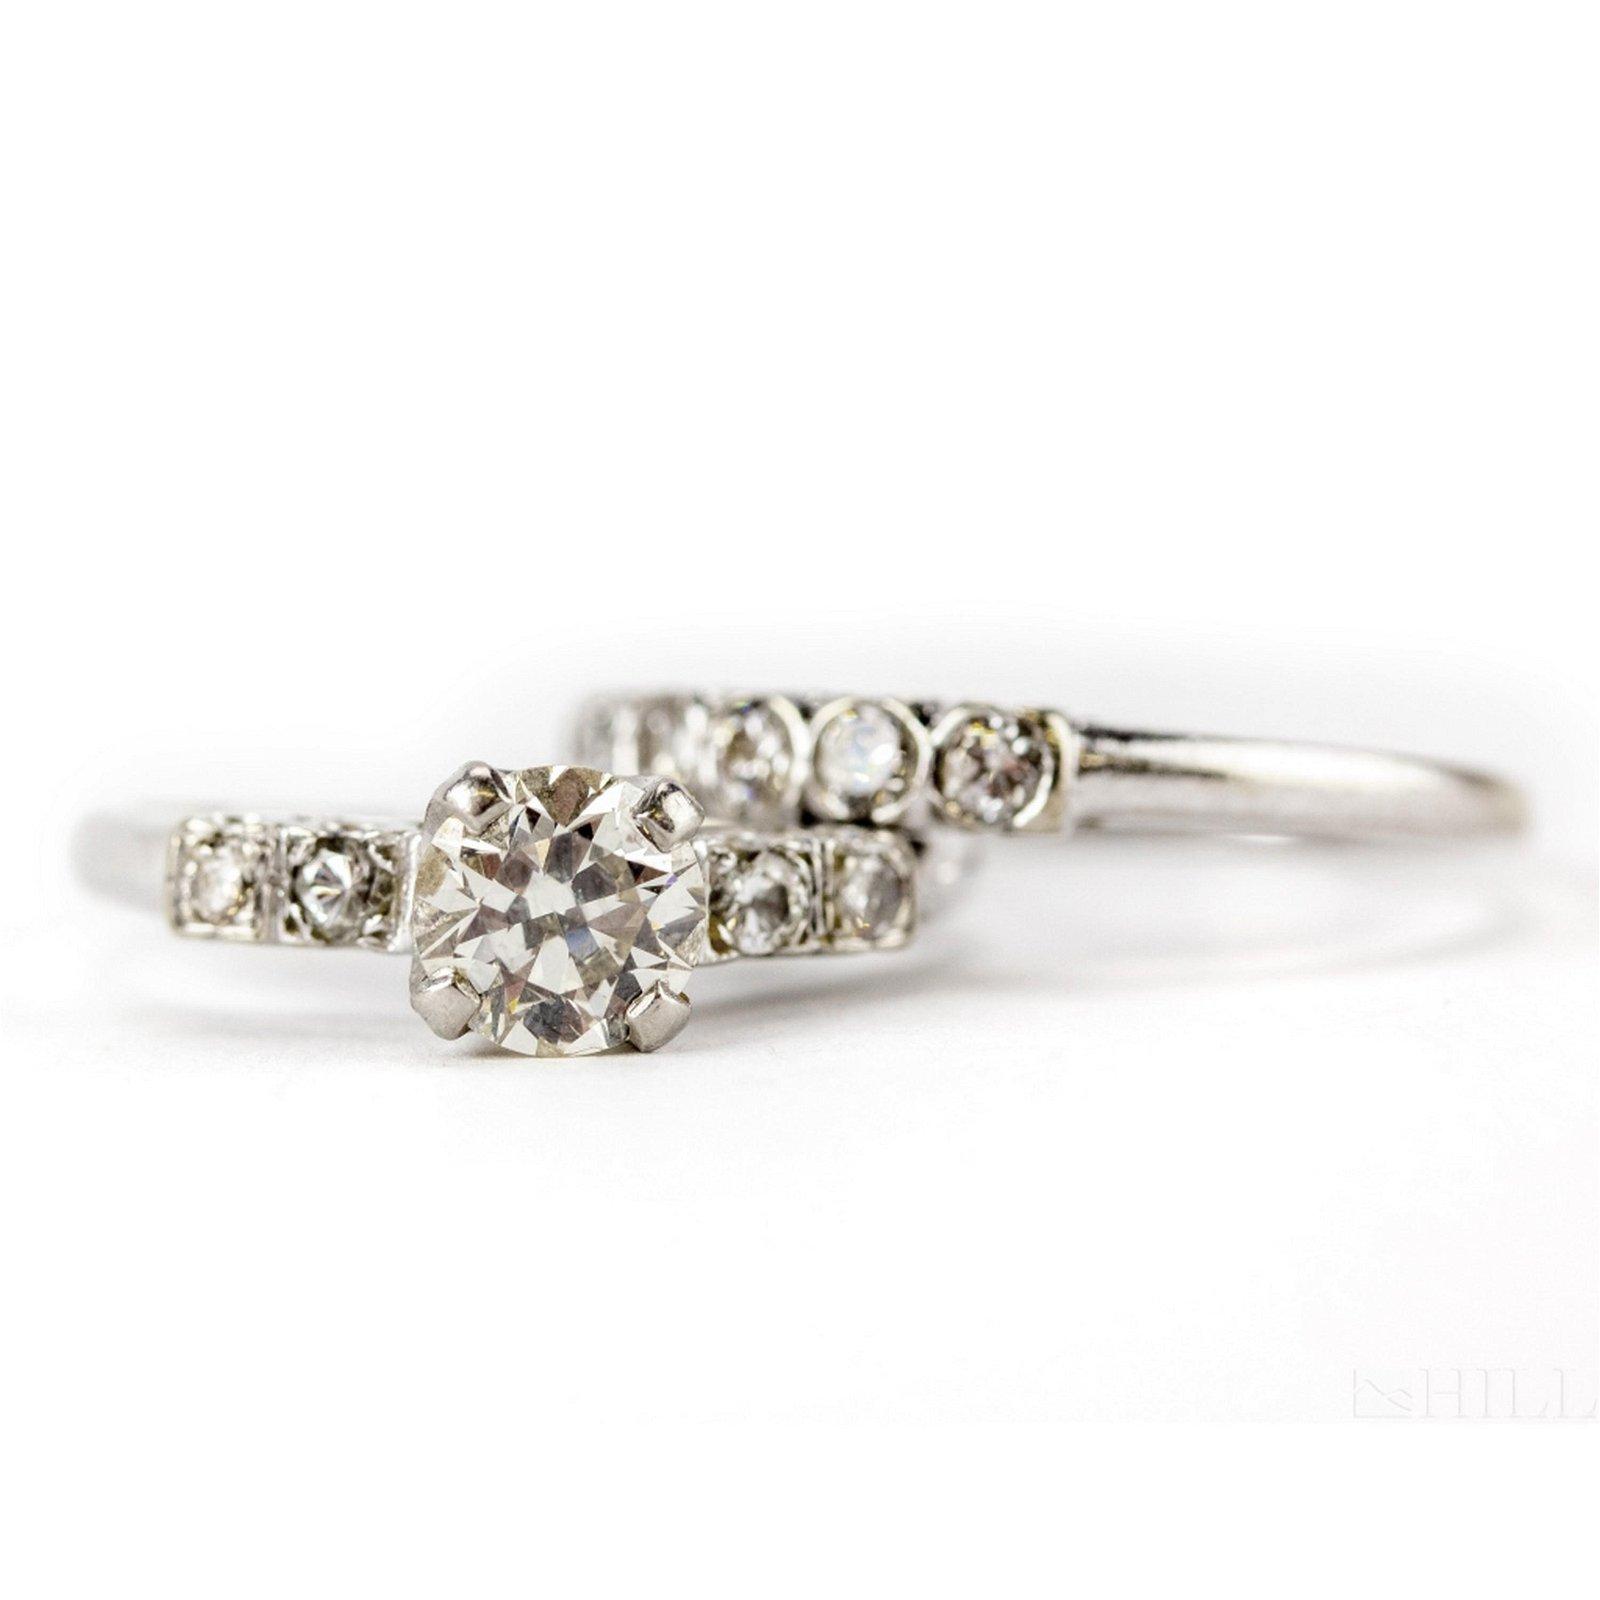 14k Gold 1 1/4 CTTW Diamond Engagement Ring SET